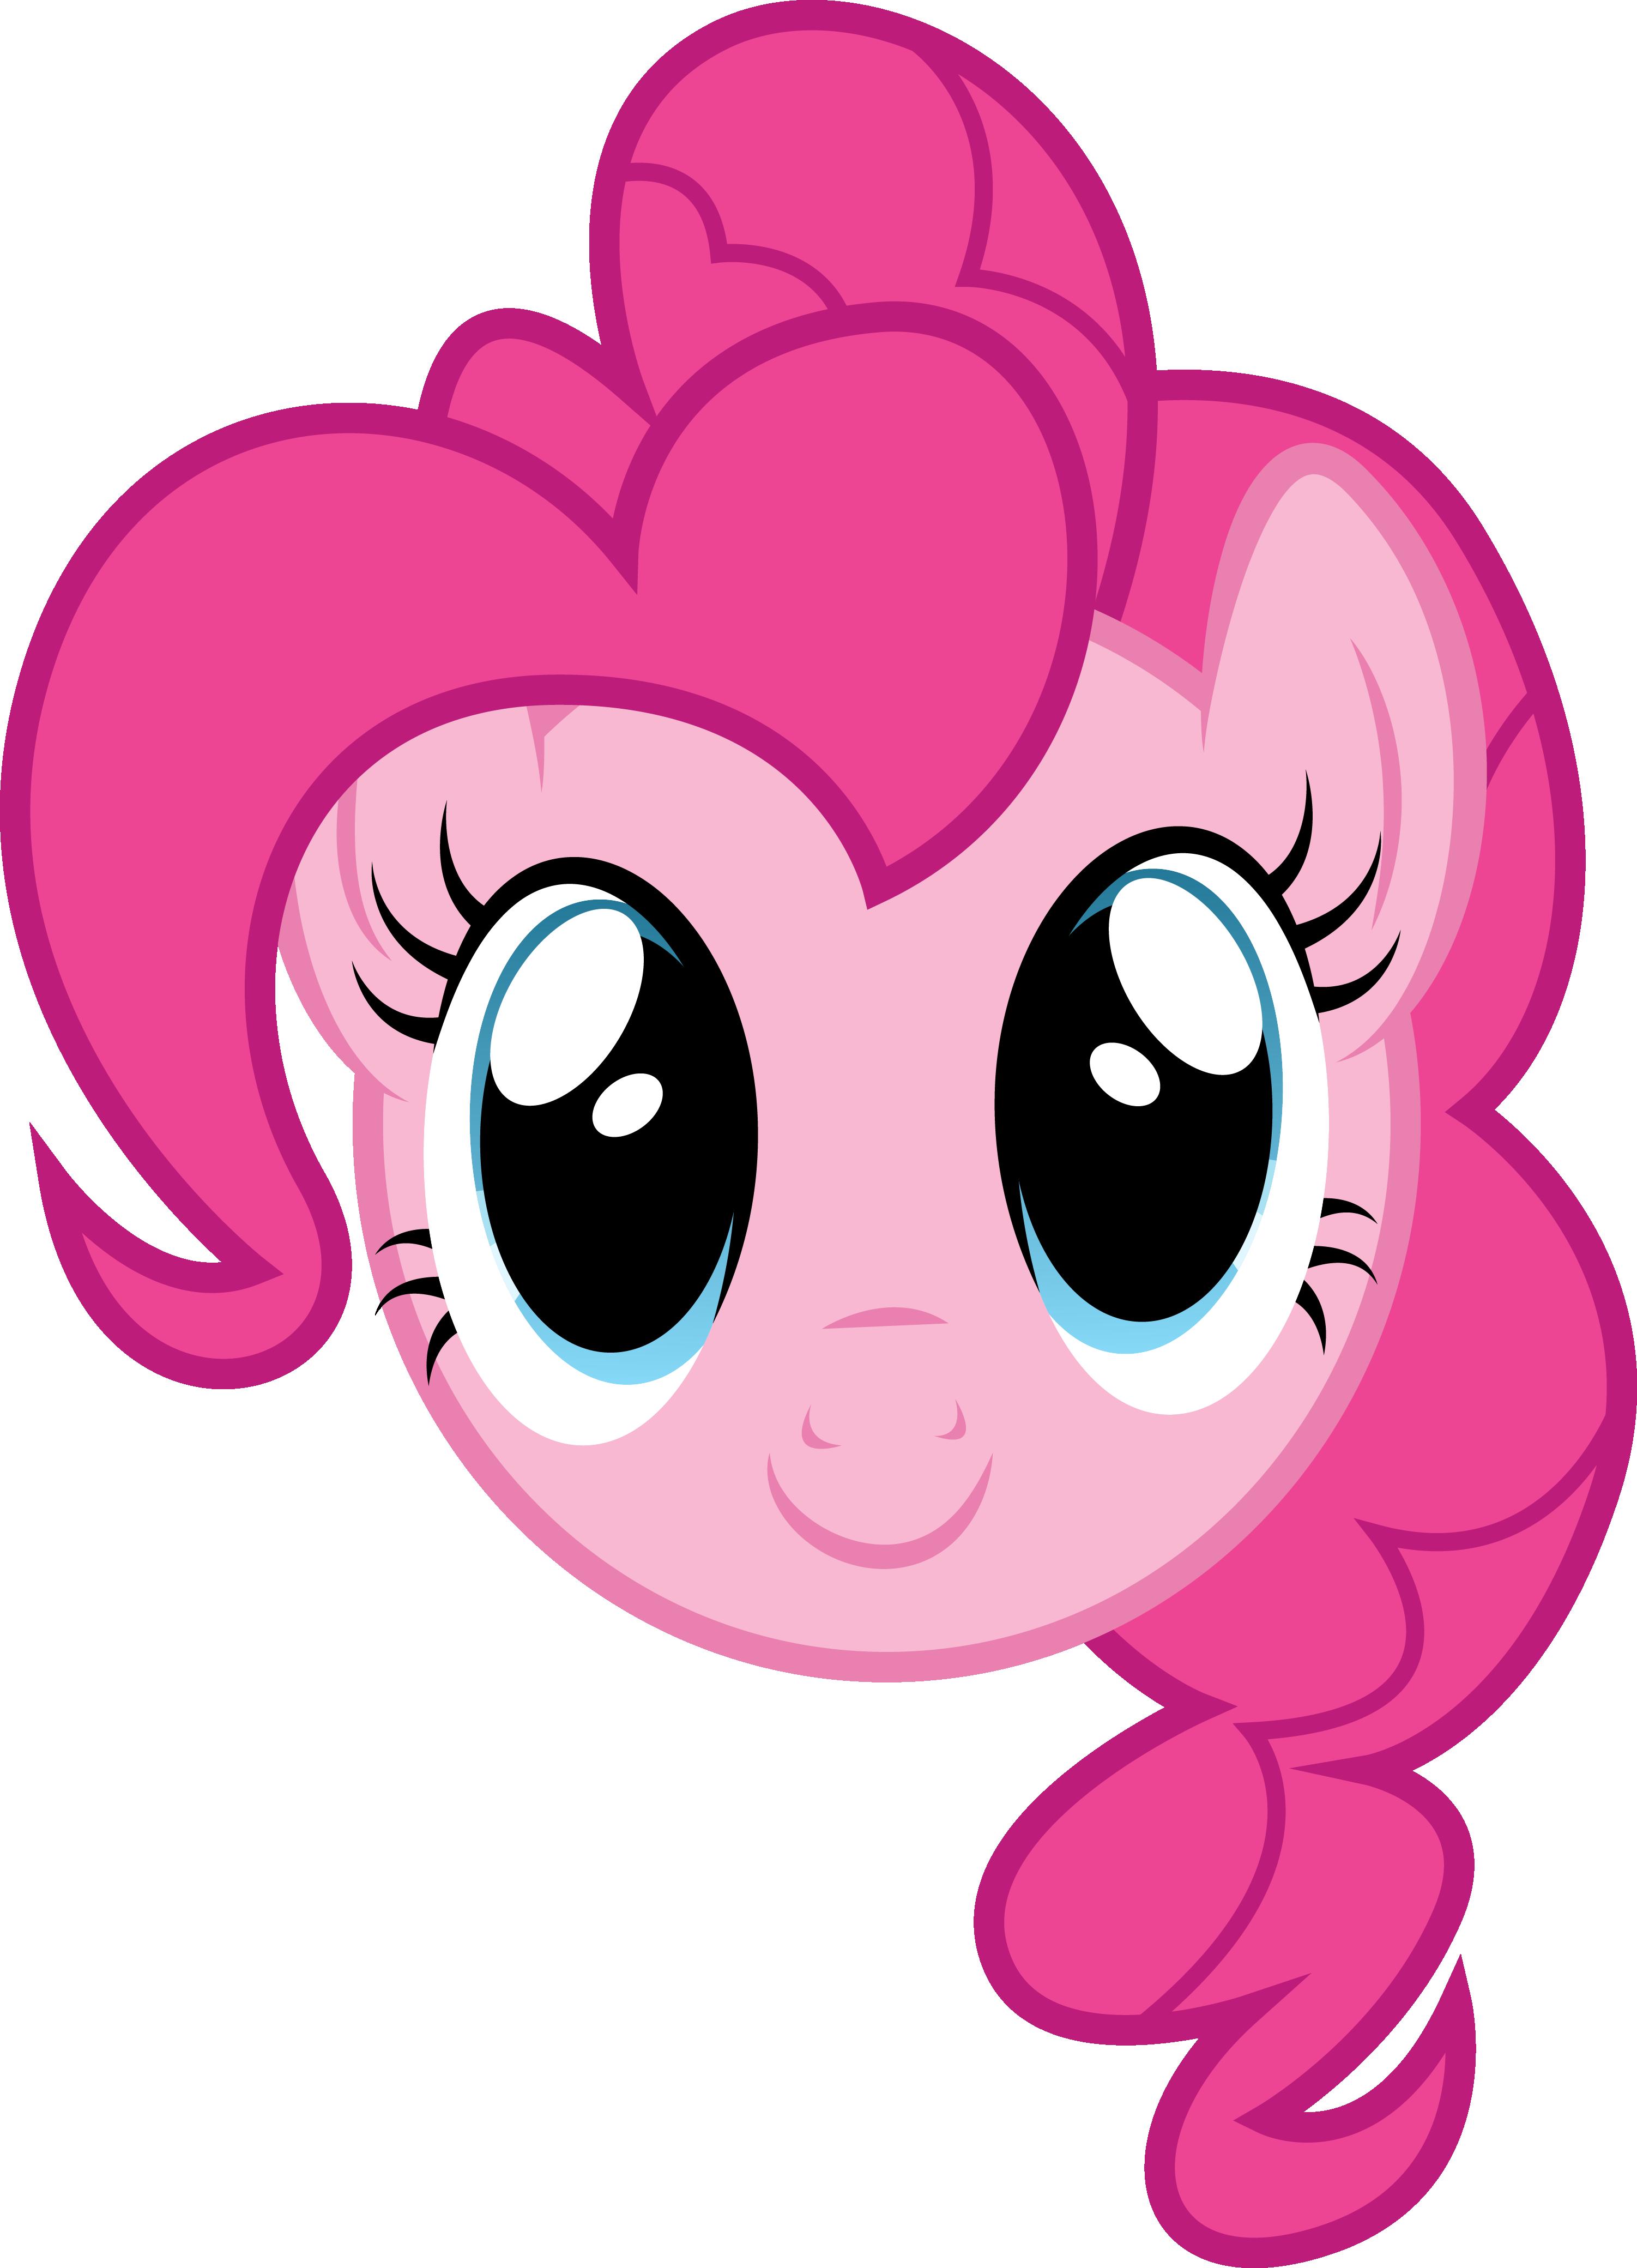 Pinkie Pie Cara Png Buscar Con Google My Little Pony Birthday My Little Pony Birthday Party Little Pony Birthday Party